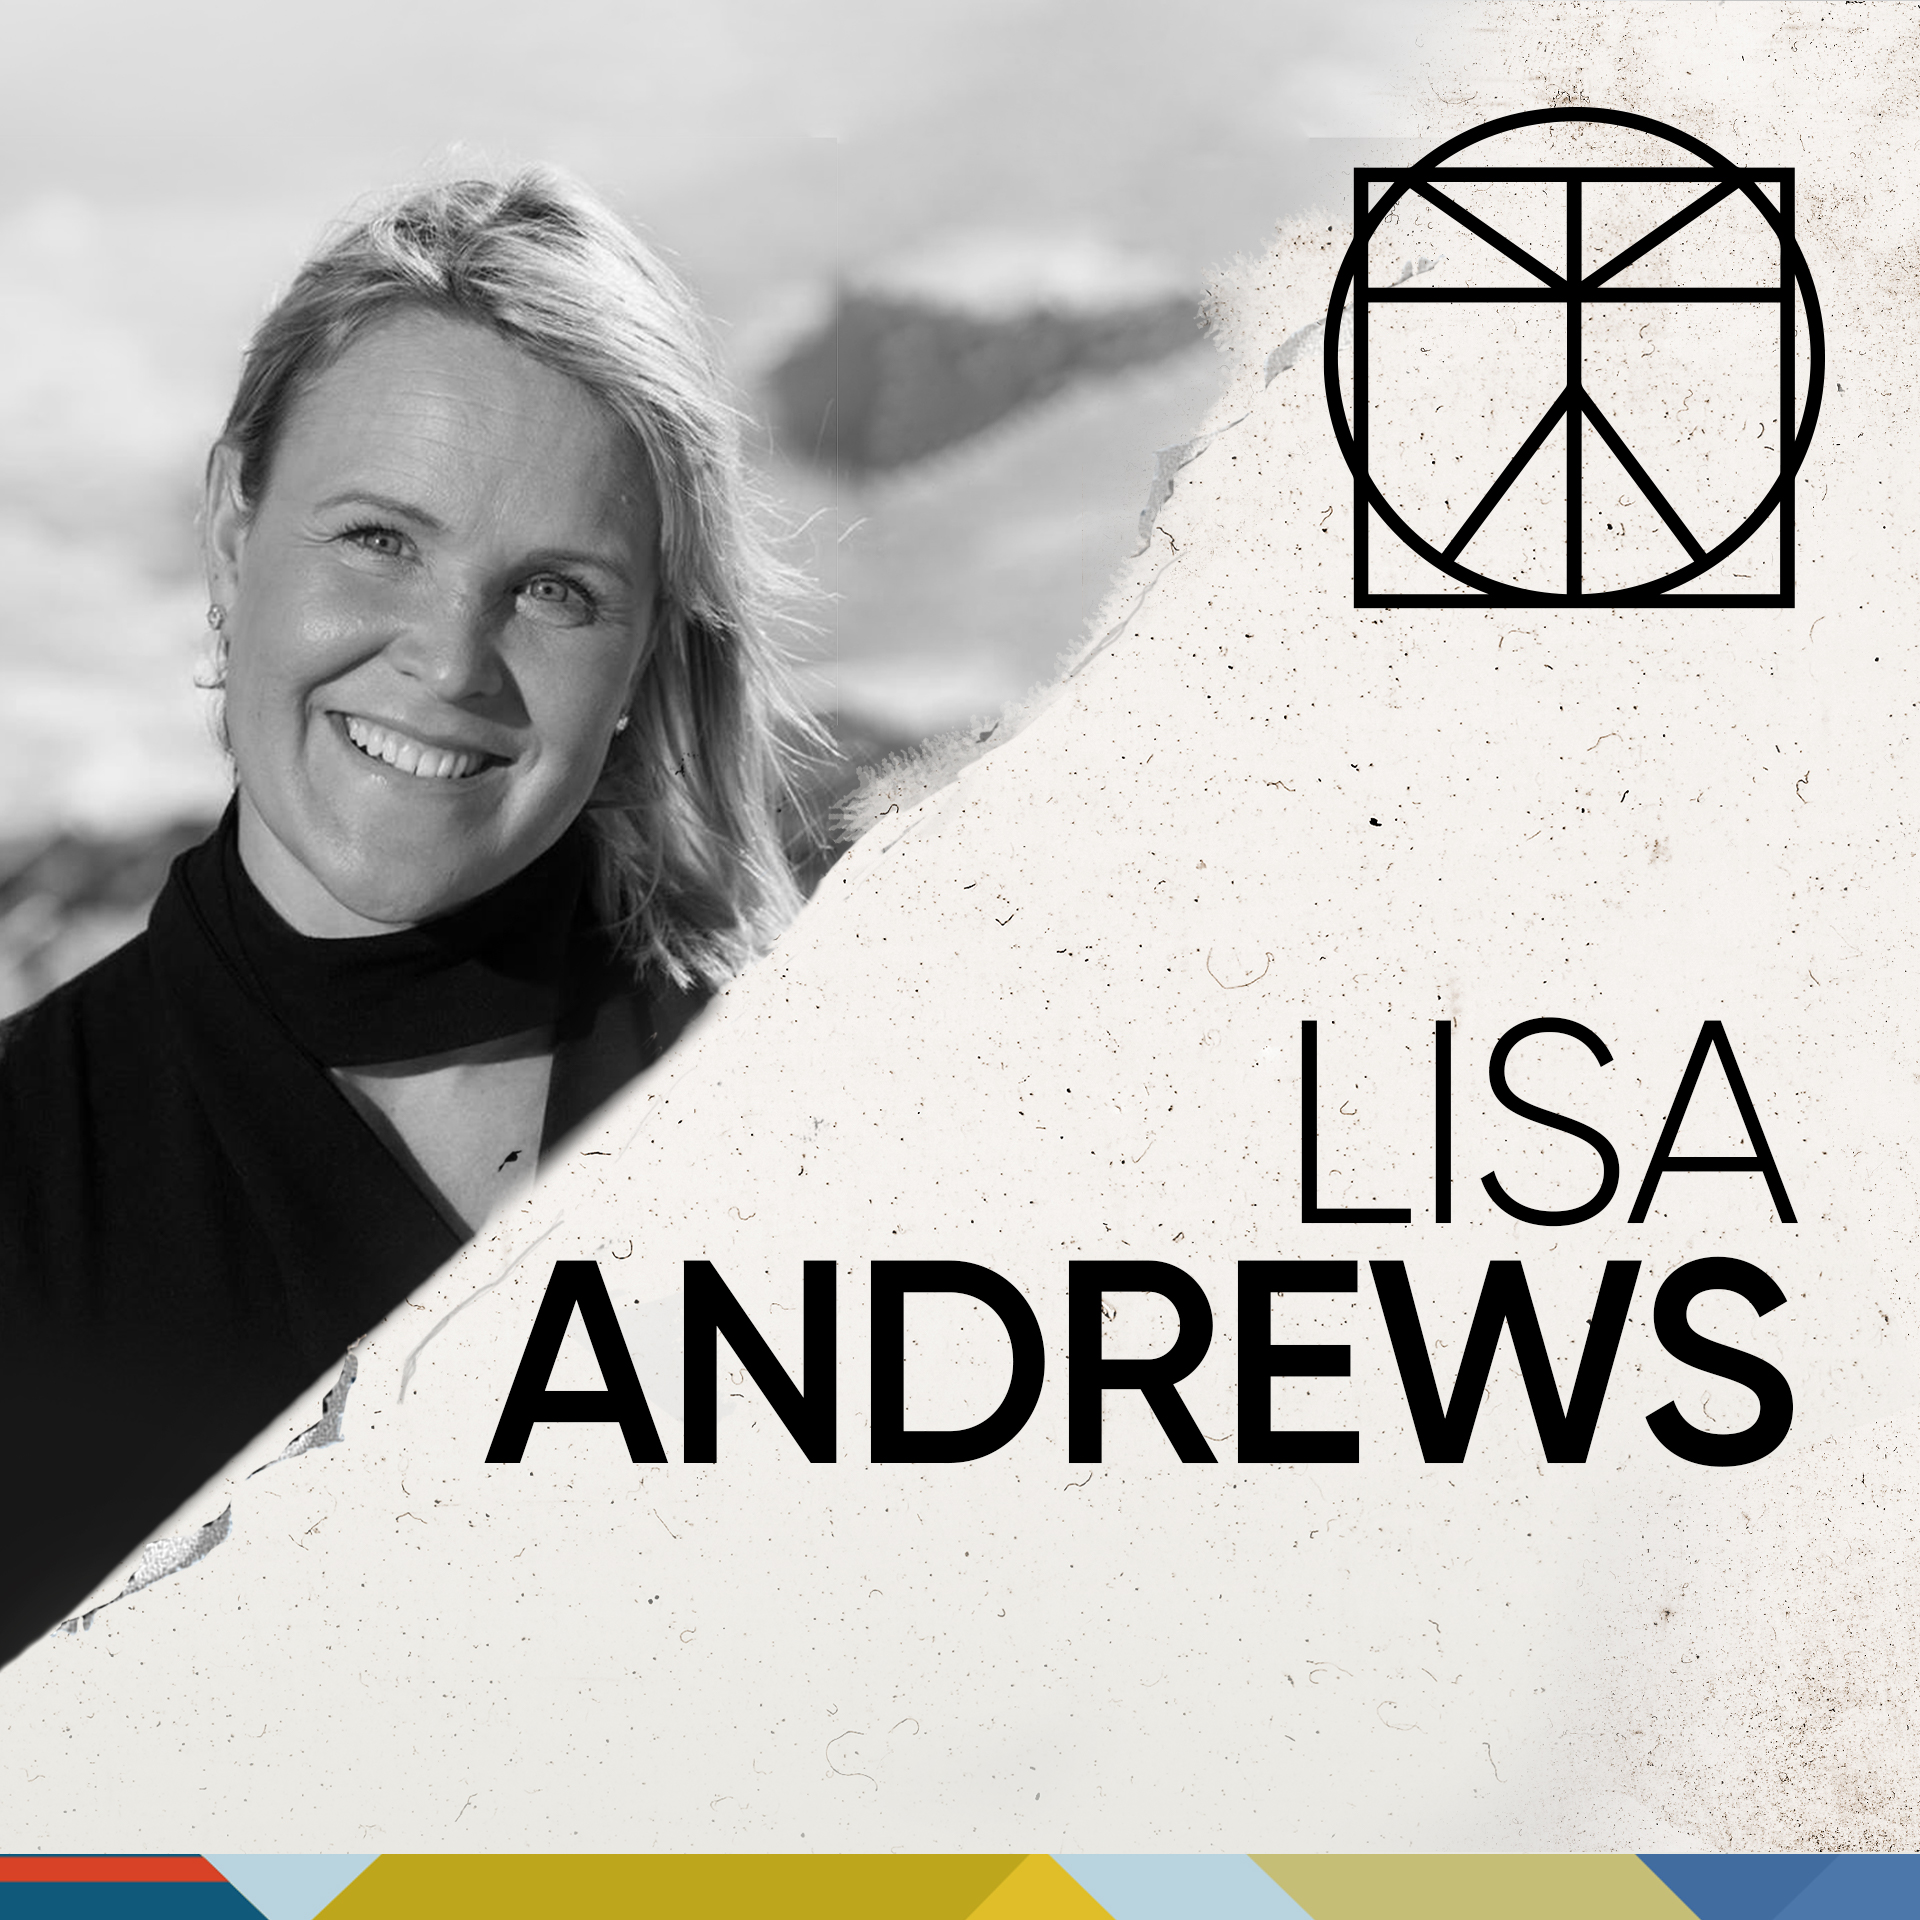 Lisa Andrews Singularity University Futurist 2nd Renaissance Podcast